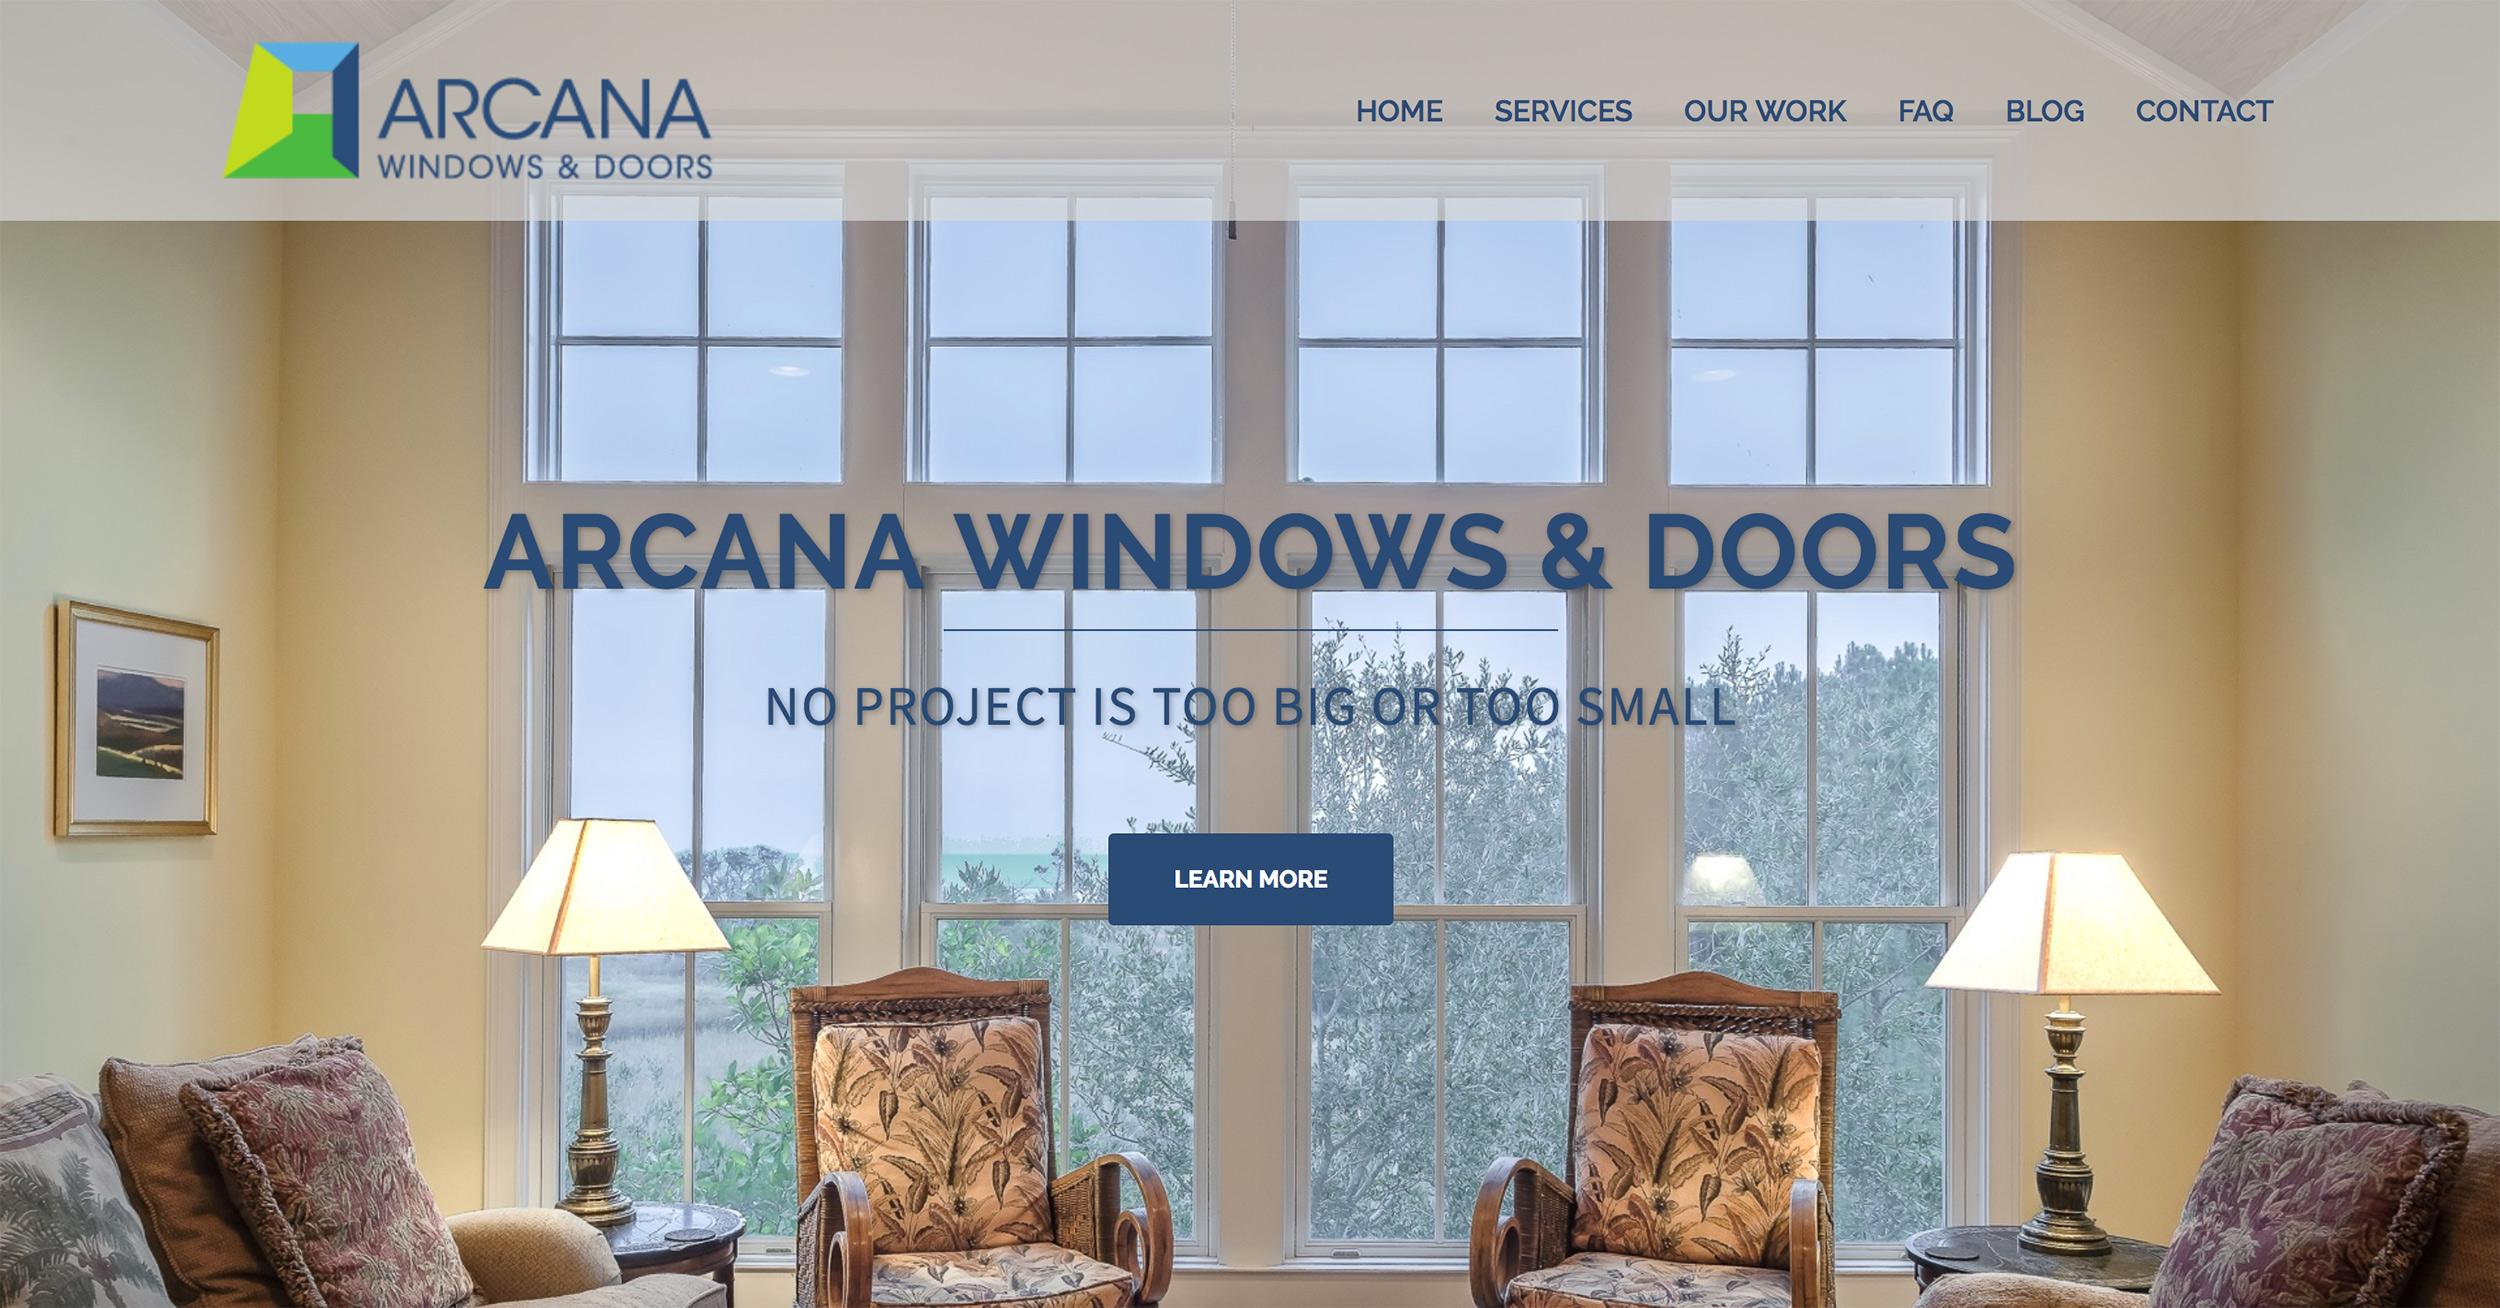 New Arcana Windows website homepage